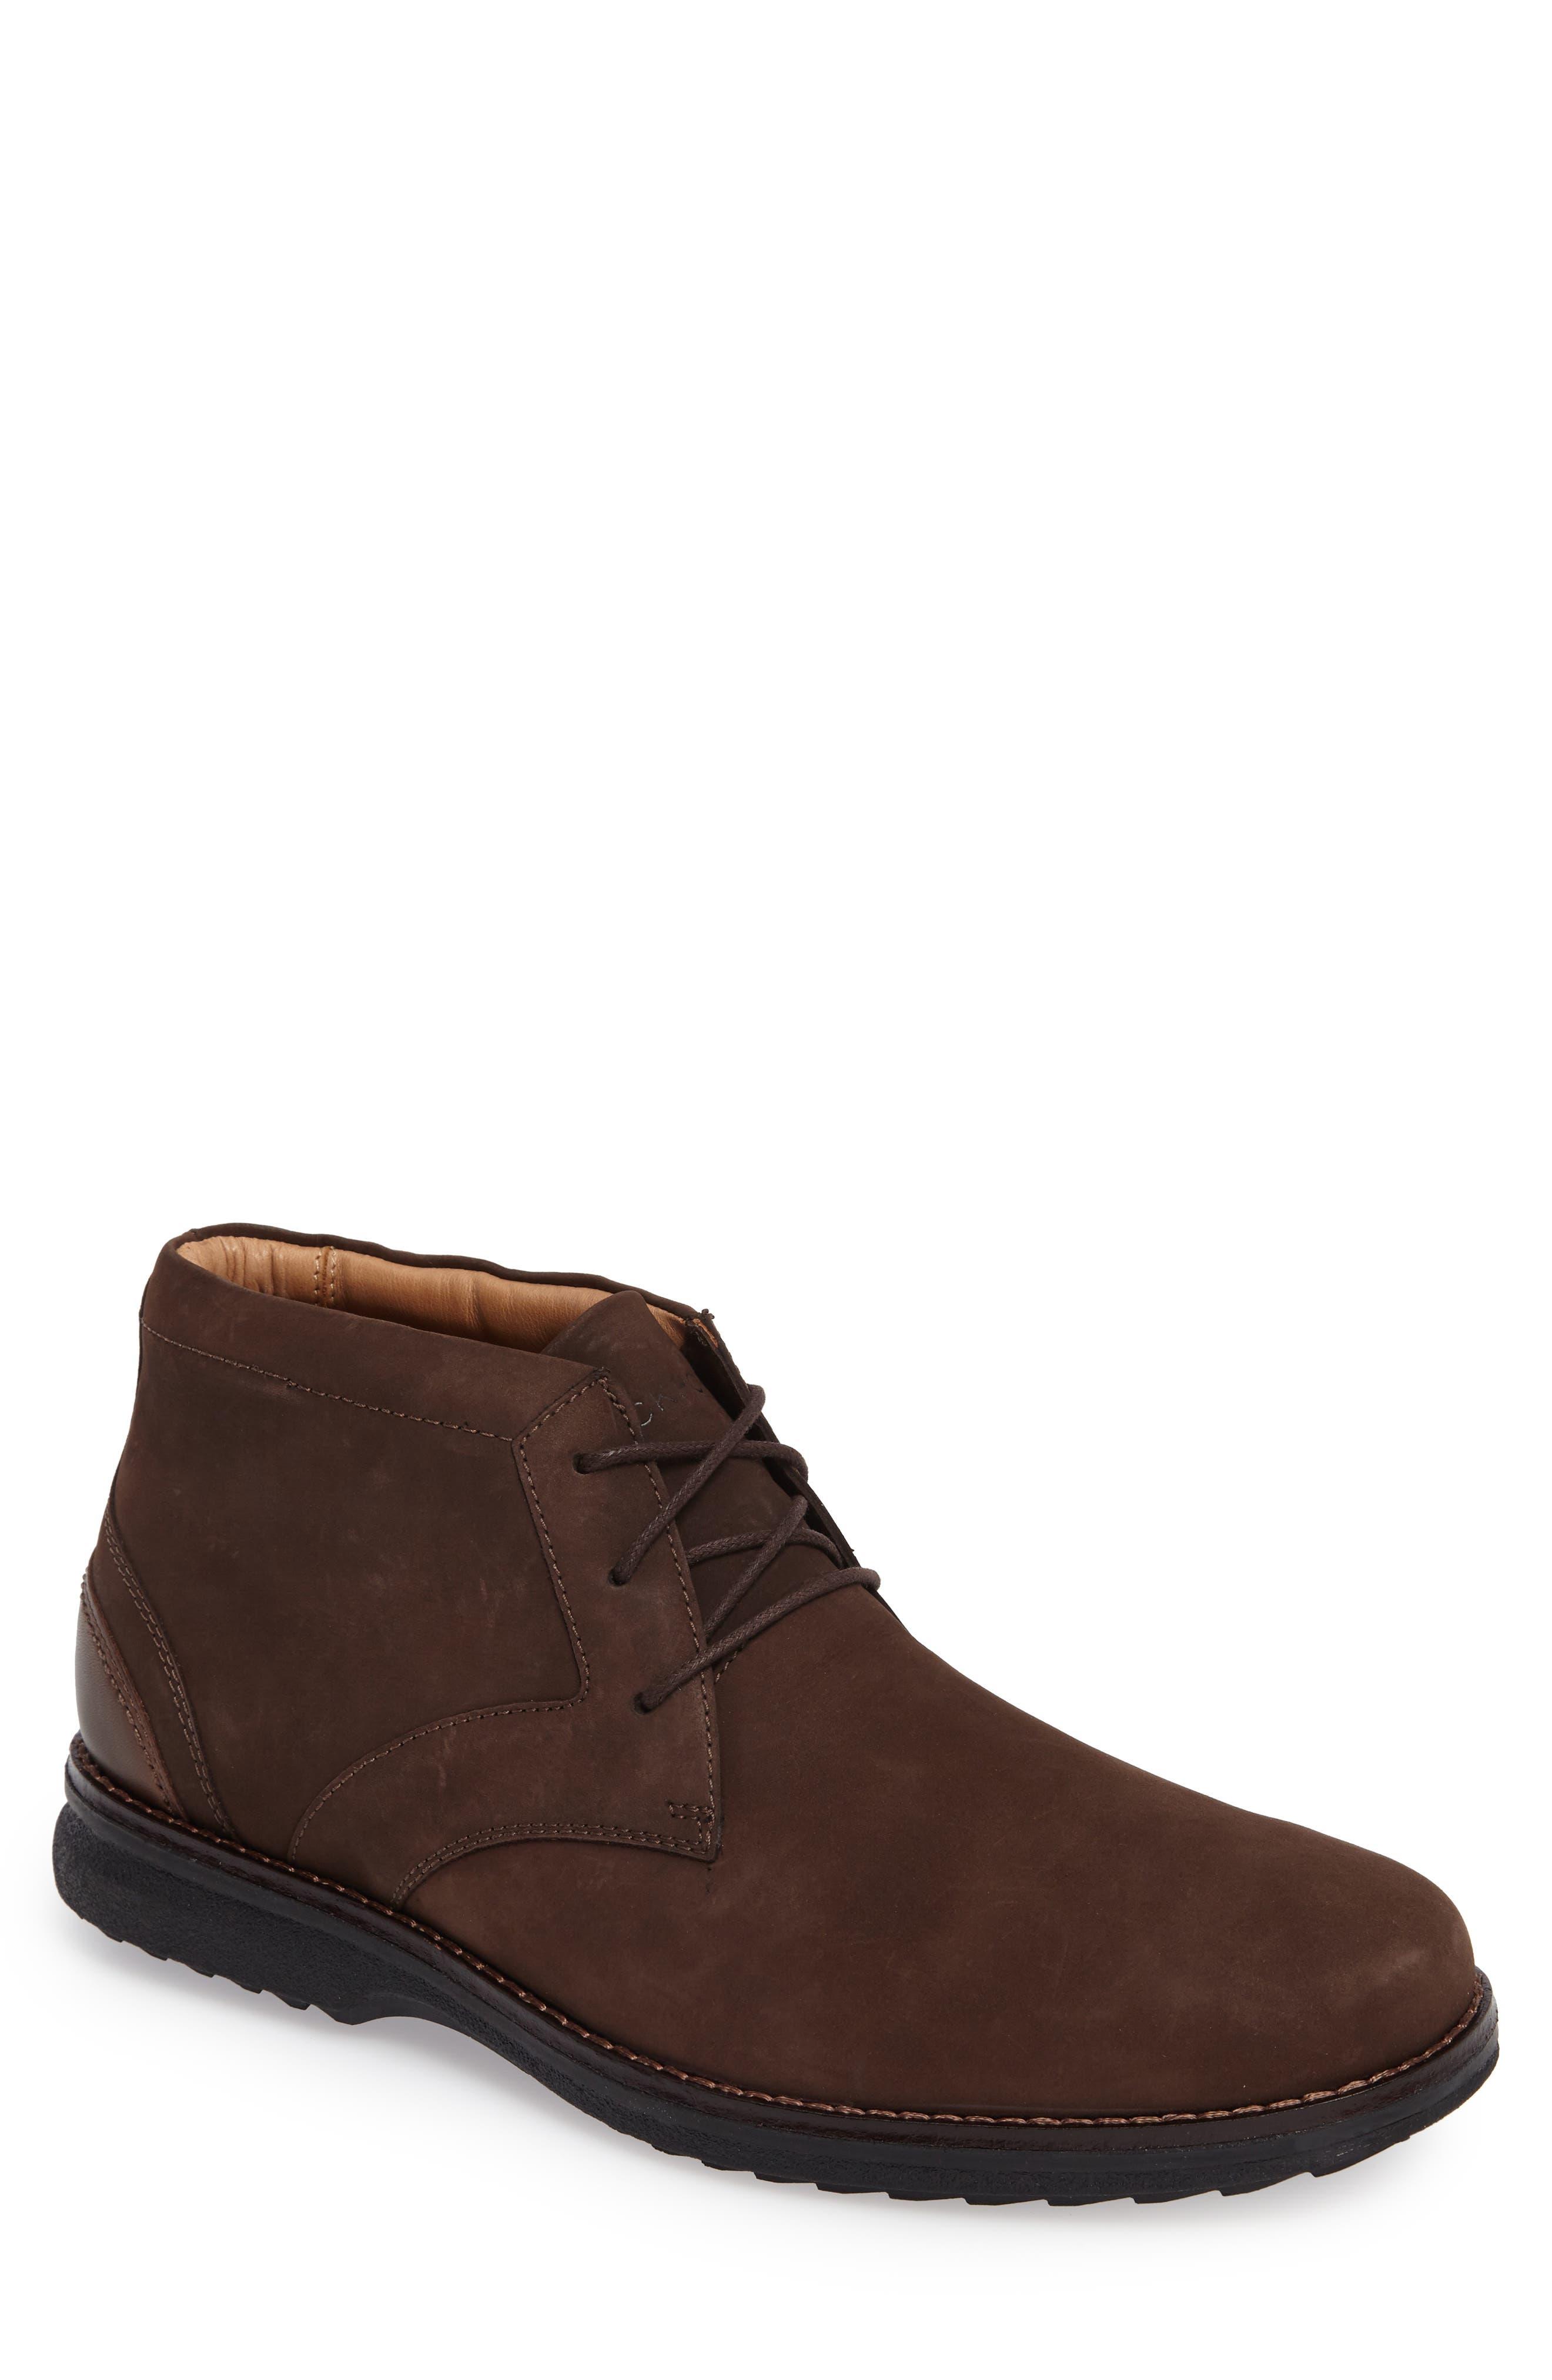 Premium Class Chukka Boot,                             Main thumbnail 1, color,                             Brown Nubuck